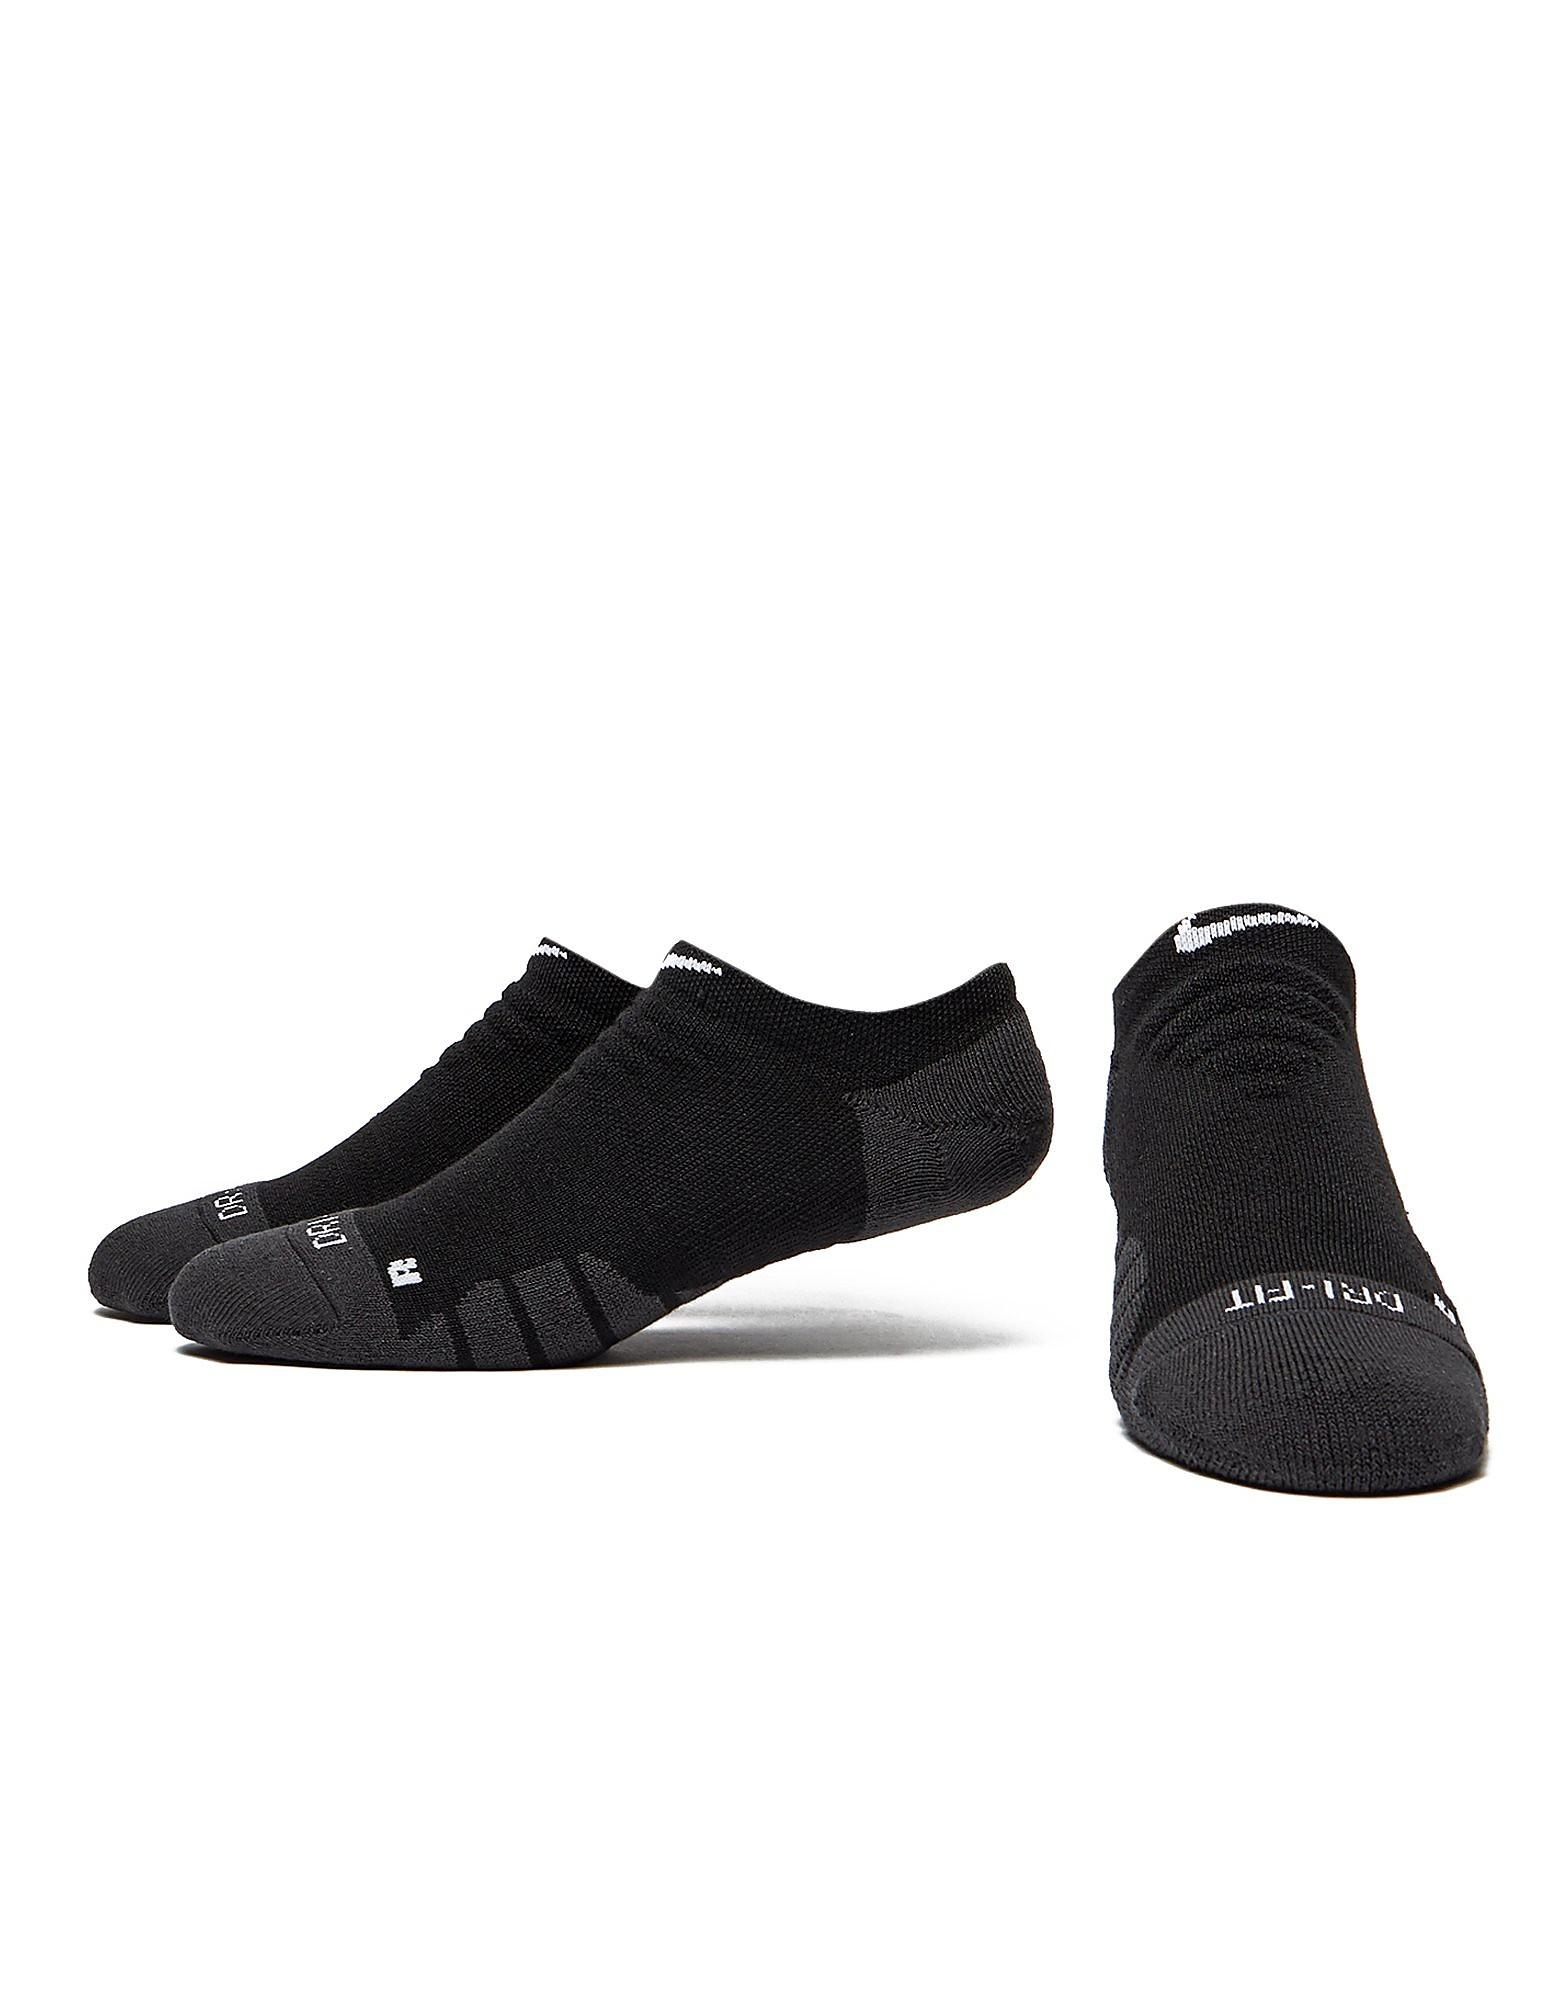 Nike Dri-FIT Quarter Socks